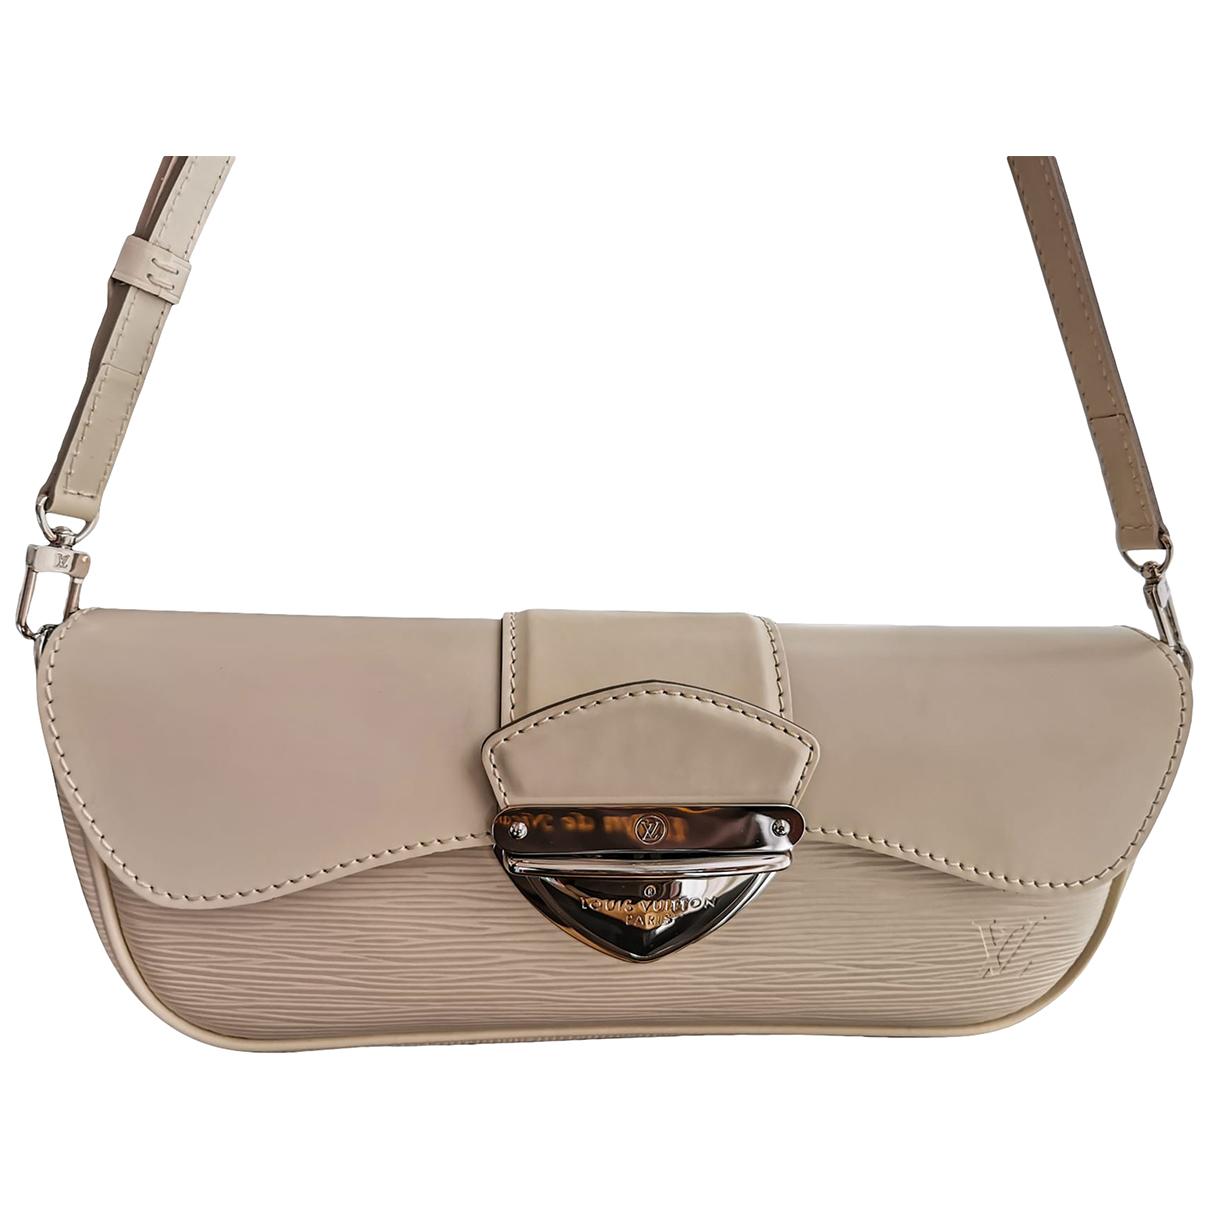 Louis Vuitton Beverly Handtasche in  Weiss Leder